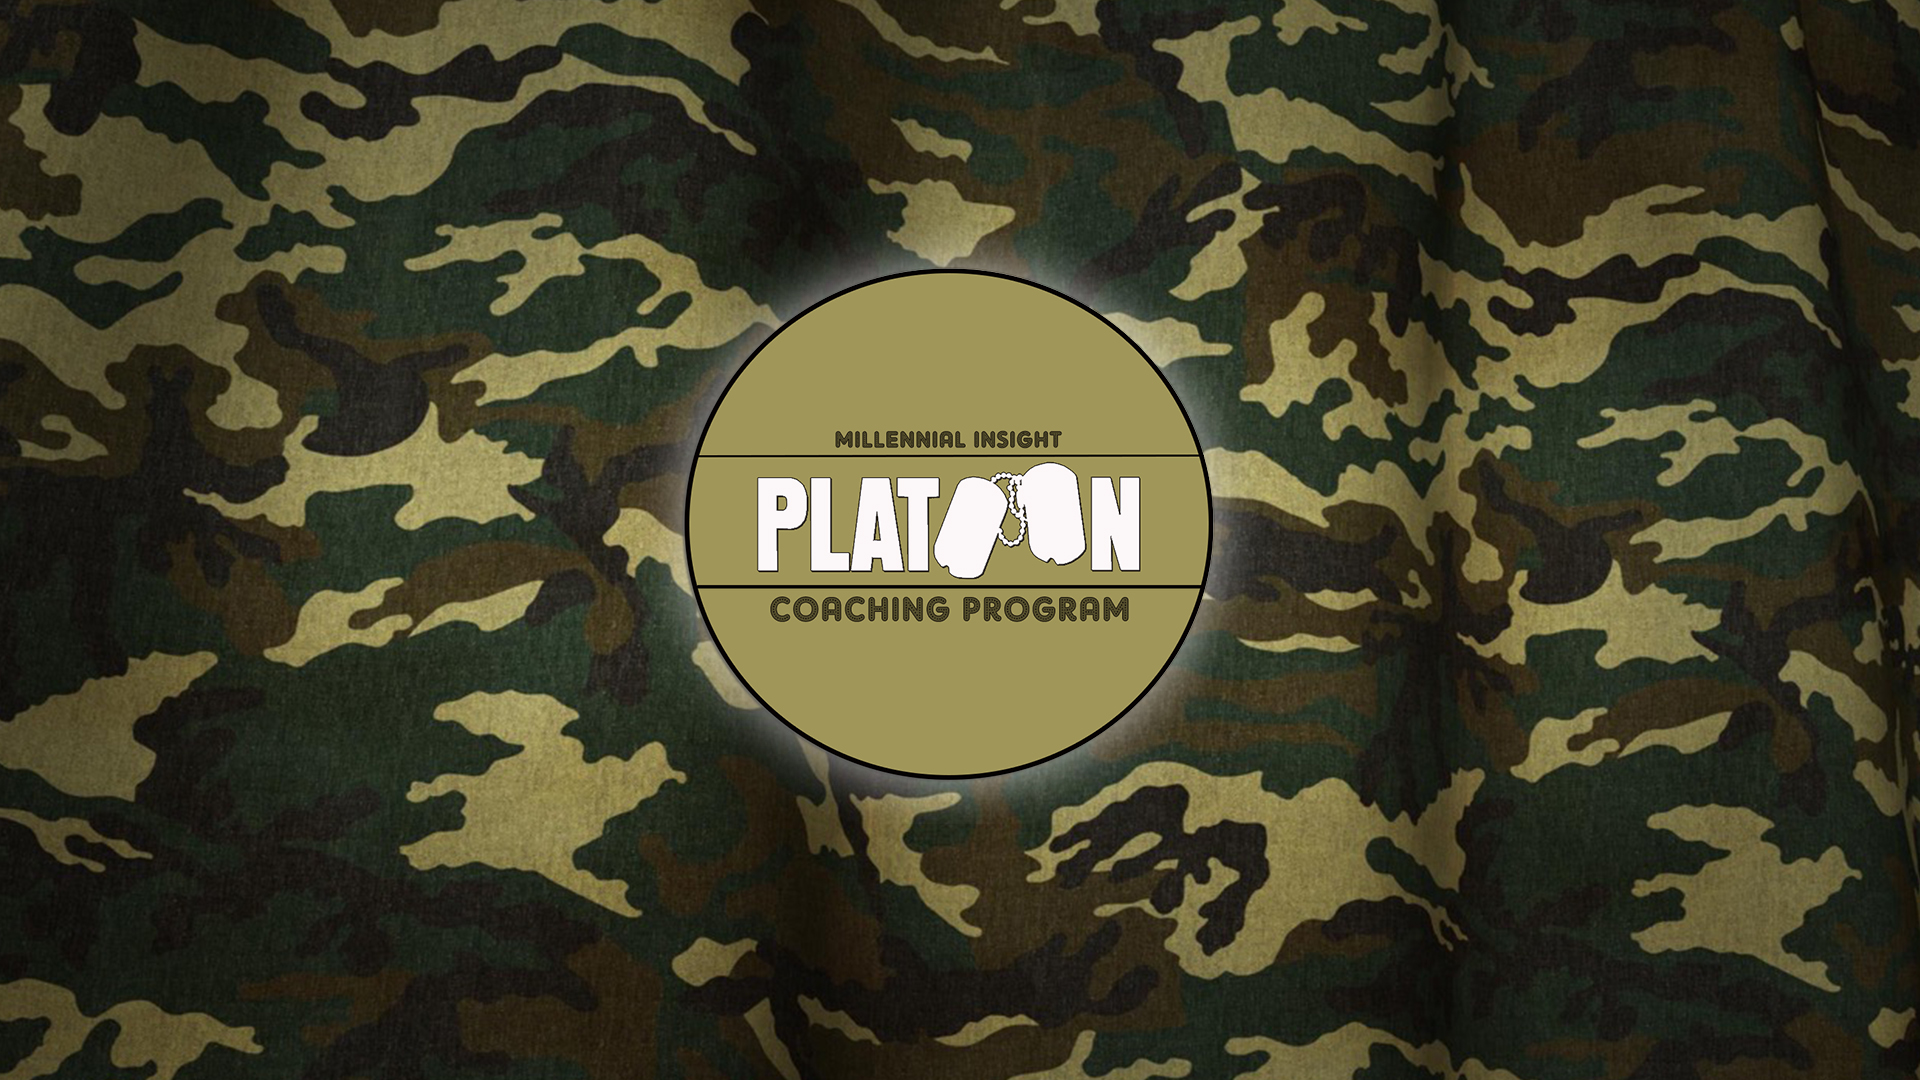 platoon center.jpg